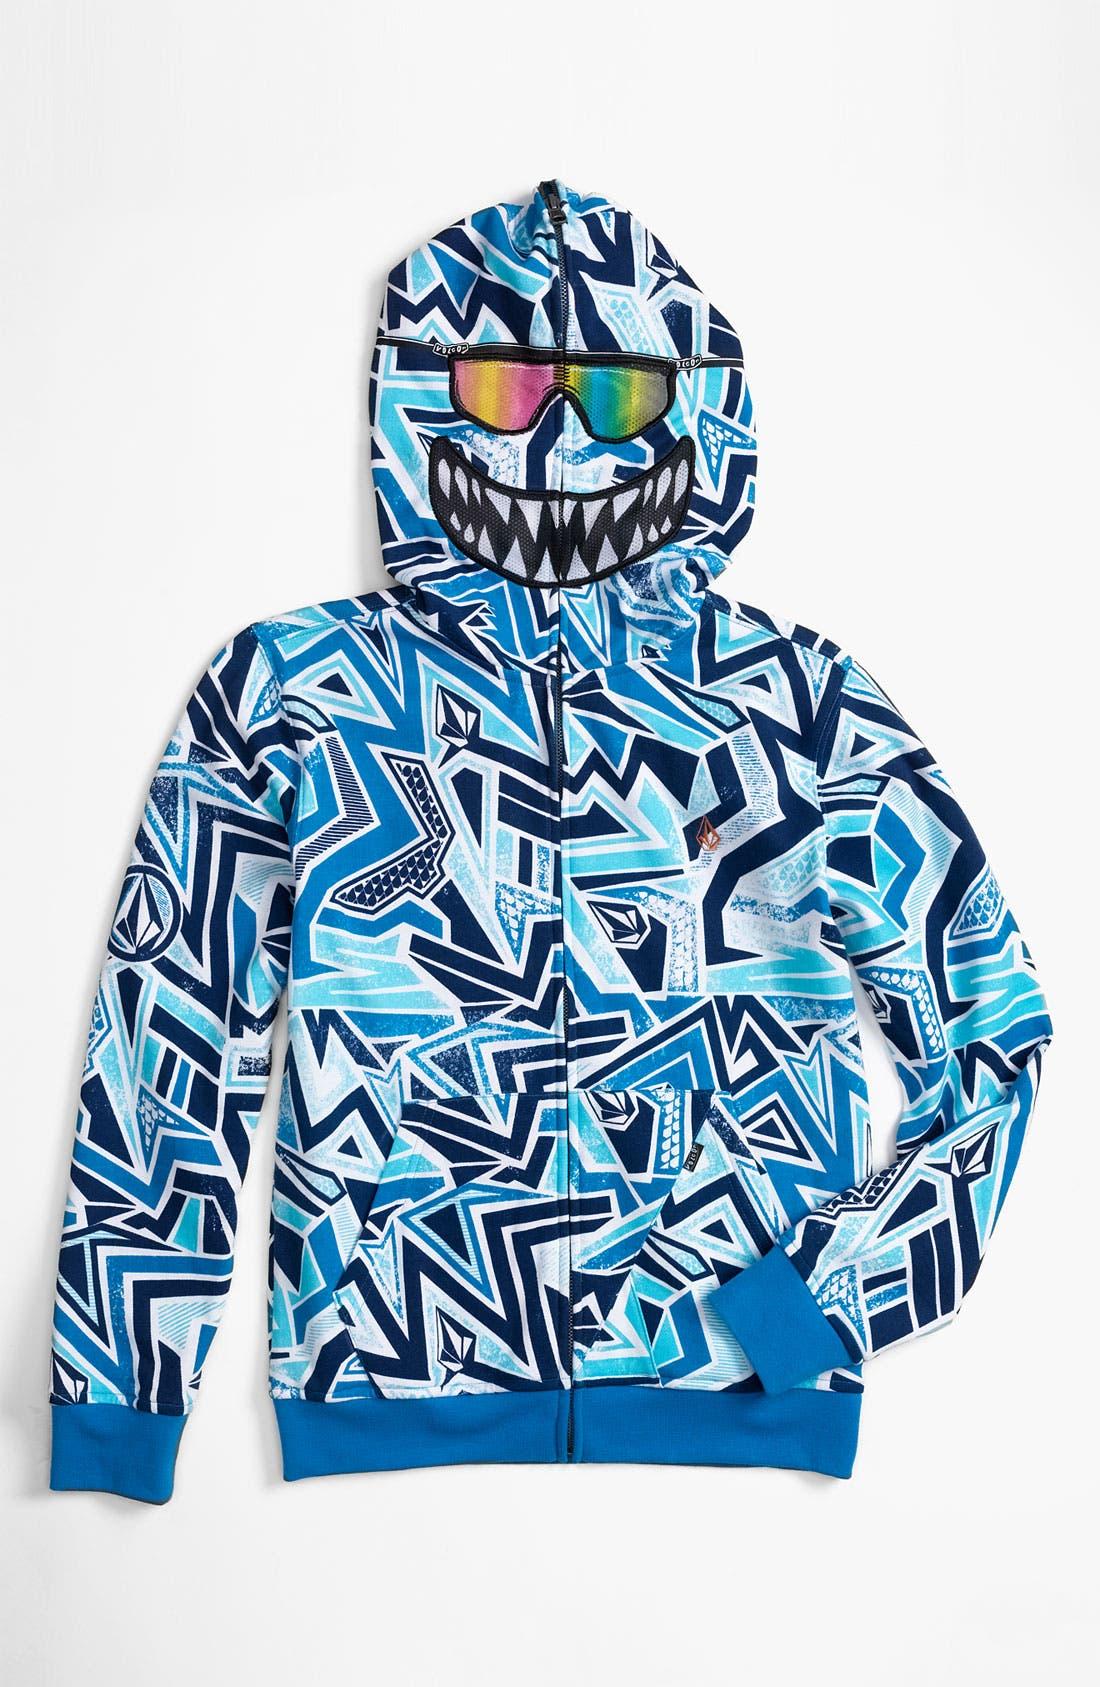 Main Image - Volcom 'Ktex' Zip Up Mask Hoodie (Big Boys)